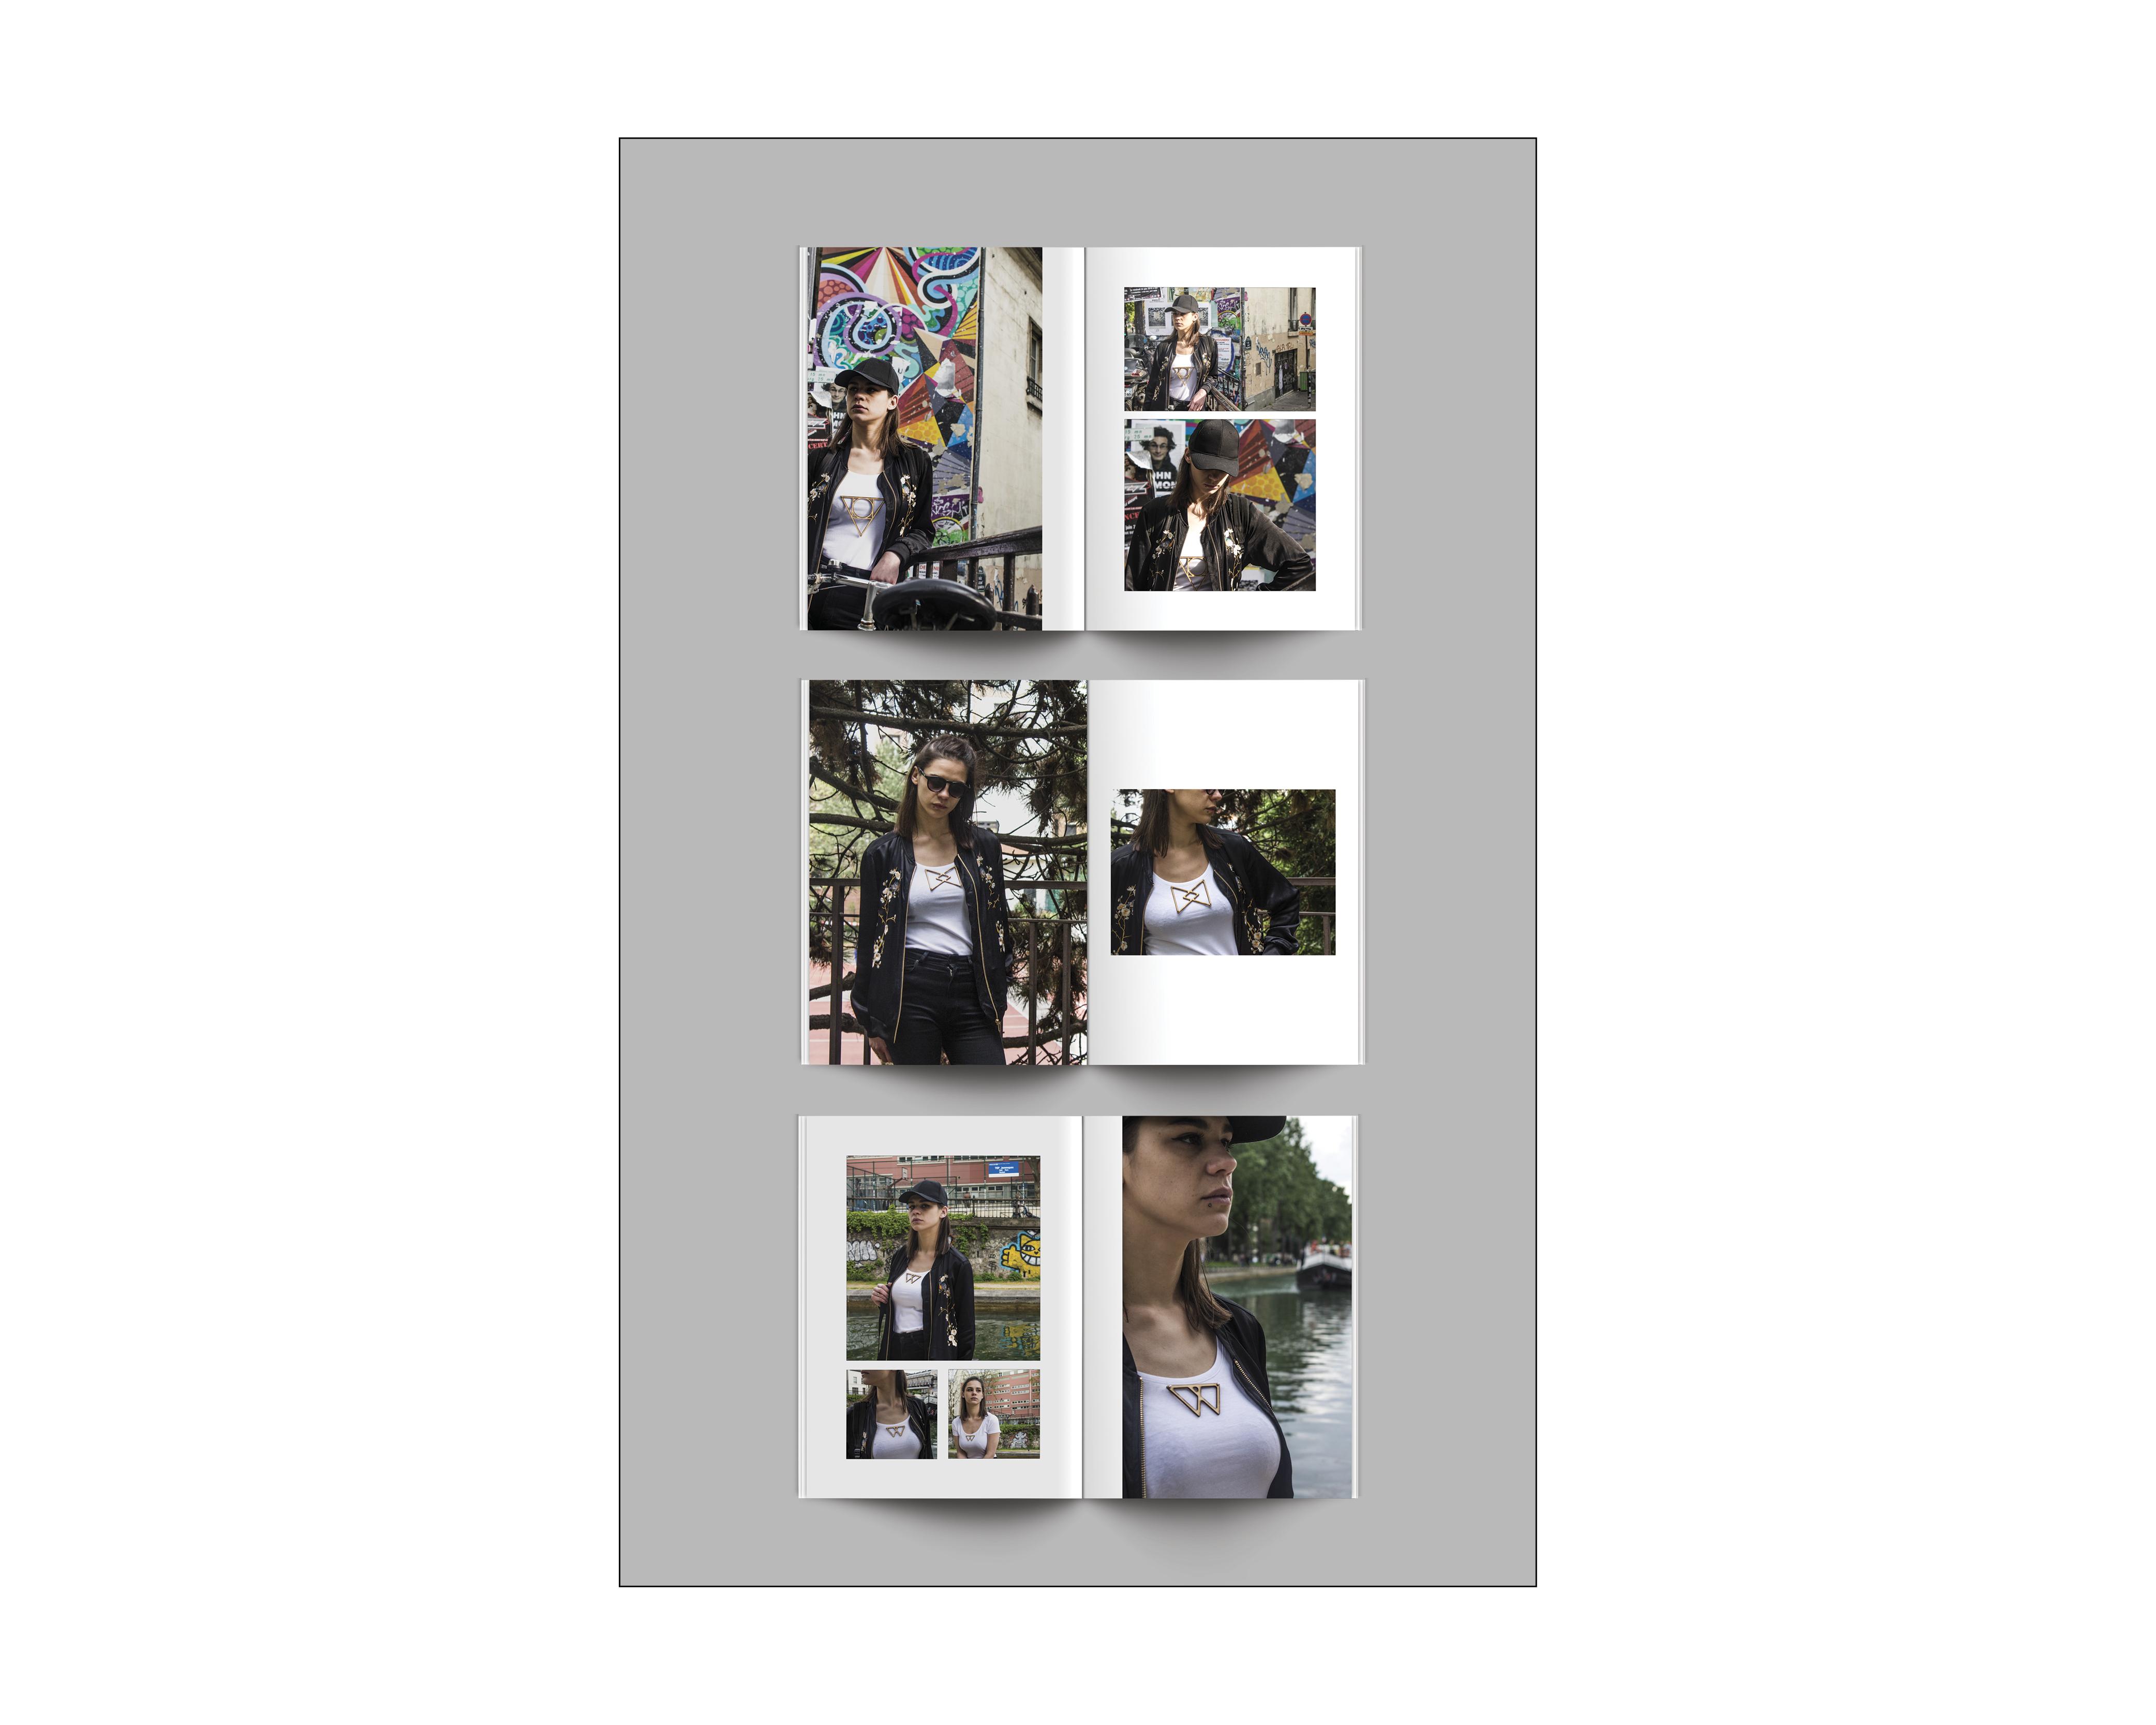 LetortCharlotte-LetricheurLookBook2